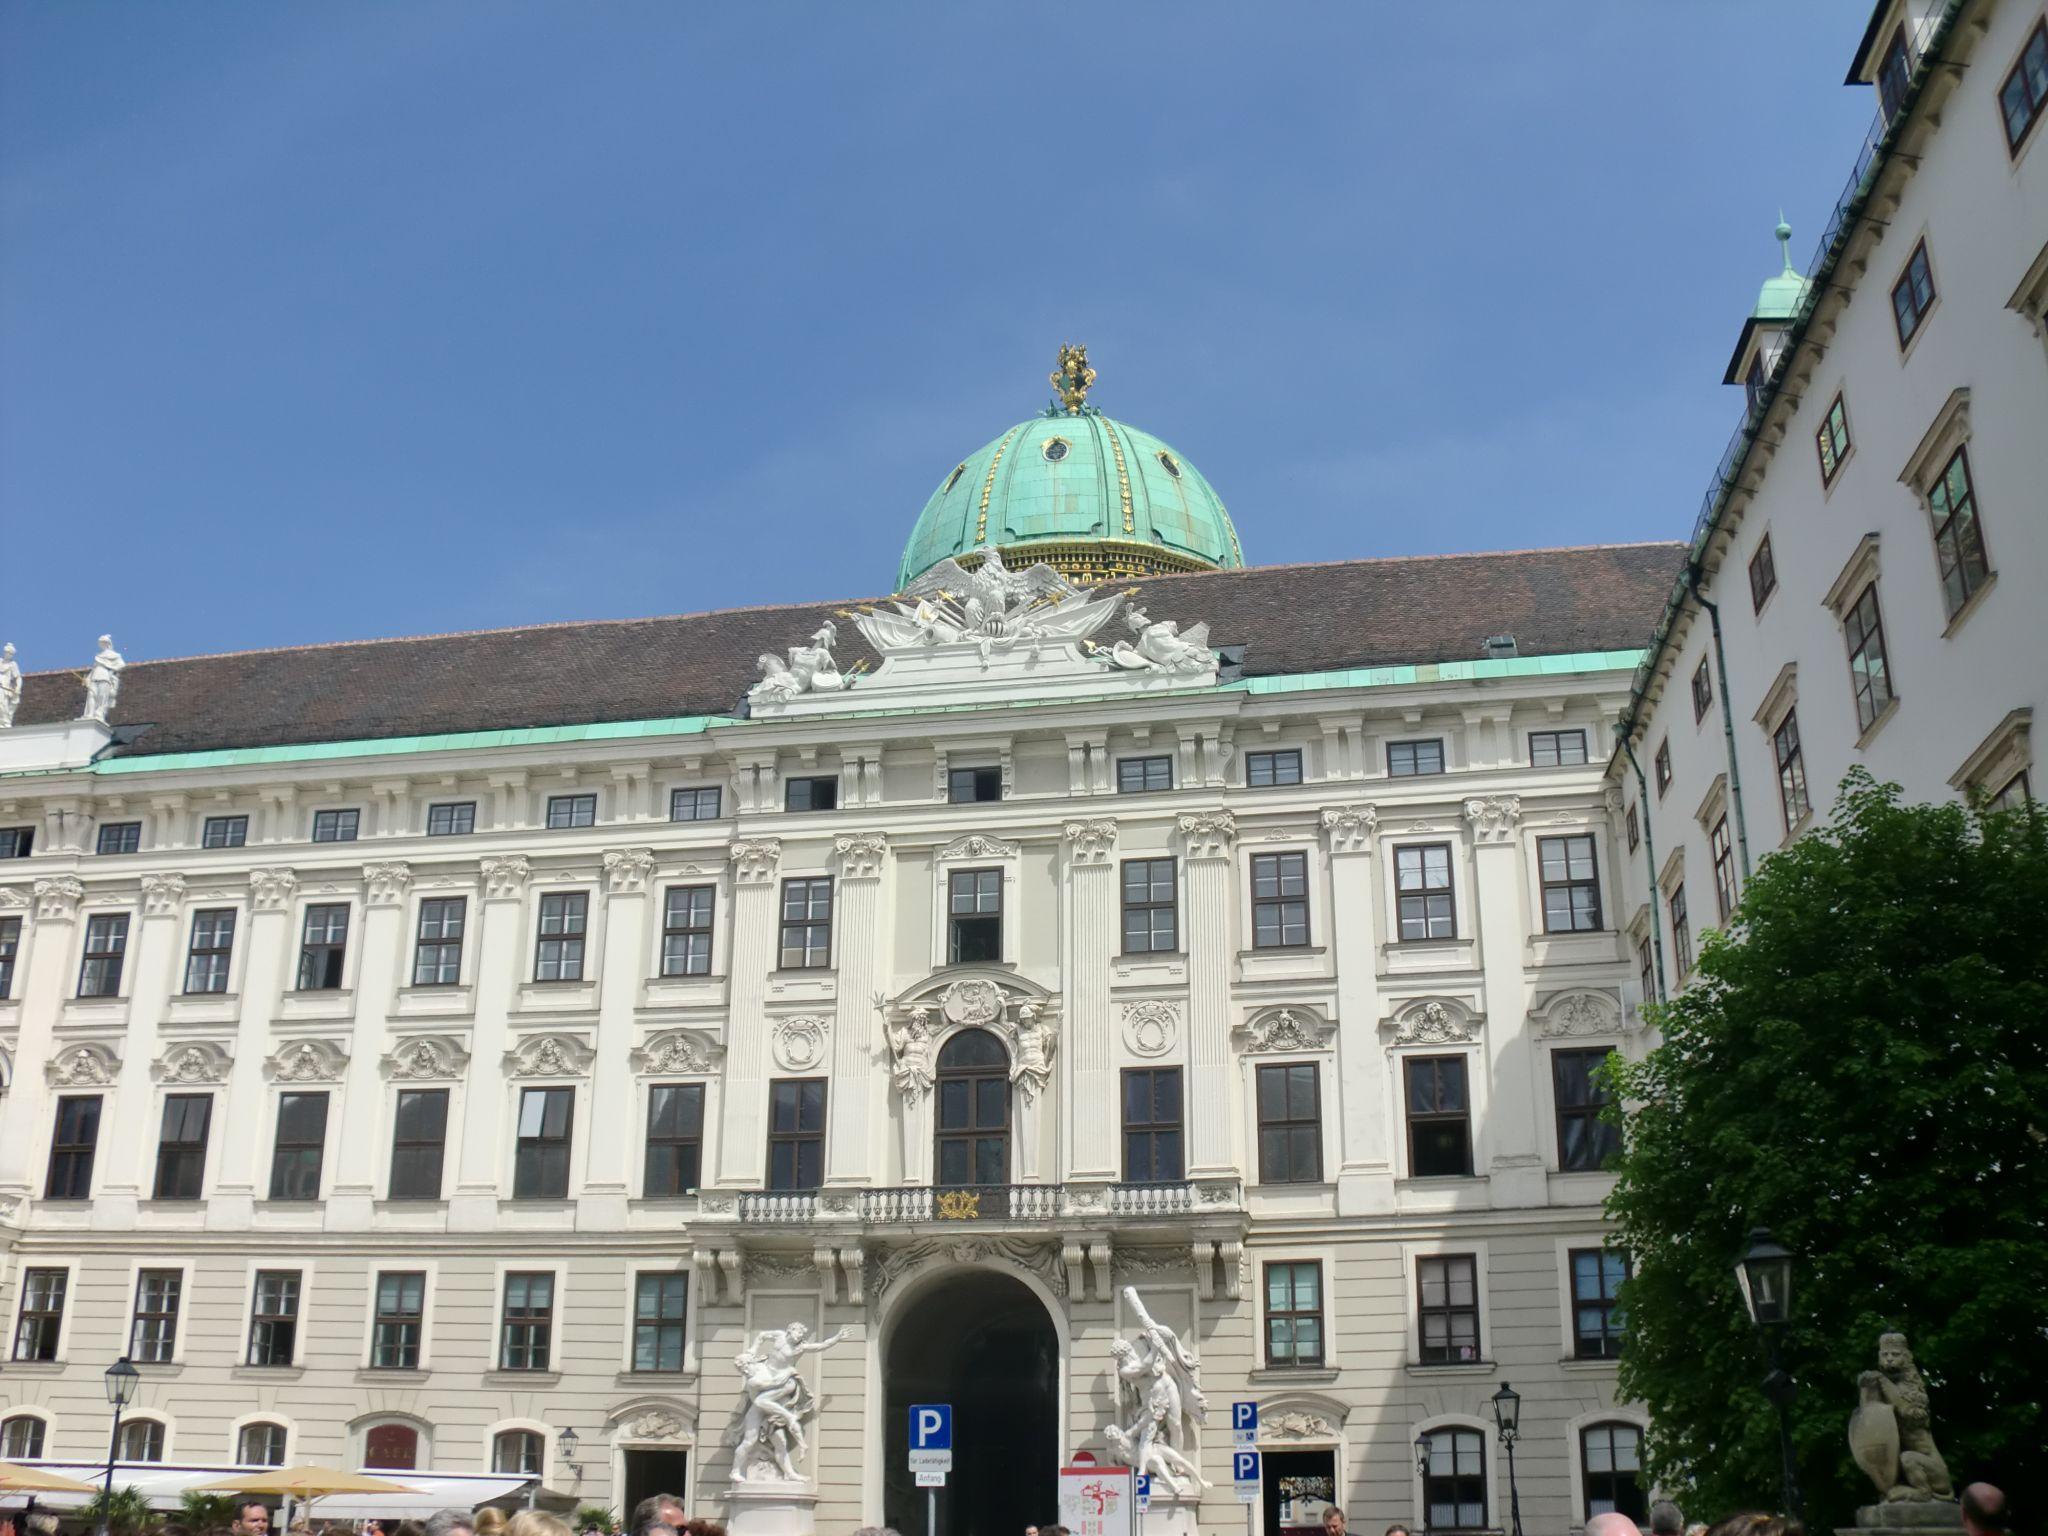 Vienna Hofburg 28 1440x1080 - Vienna: elegant beauty